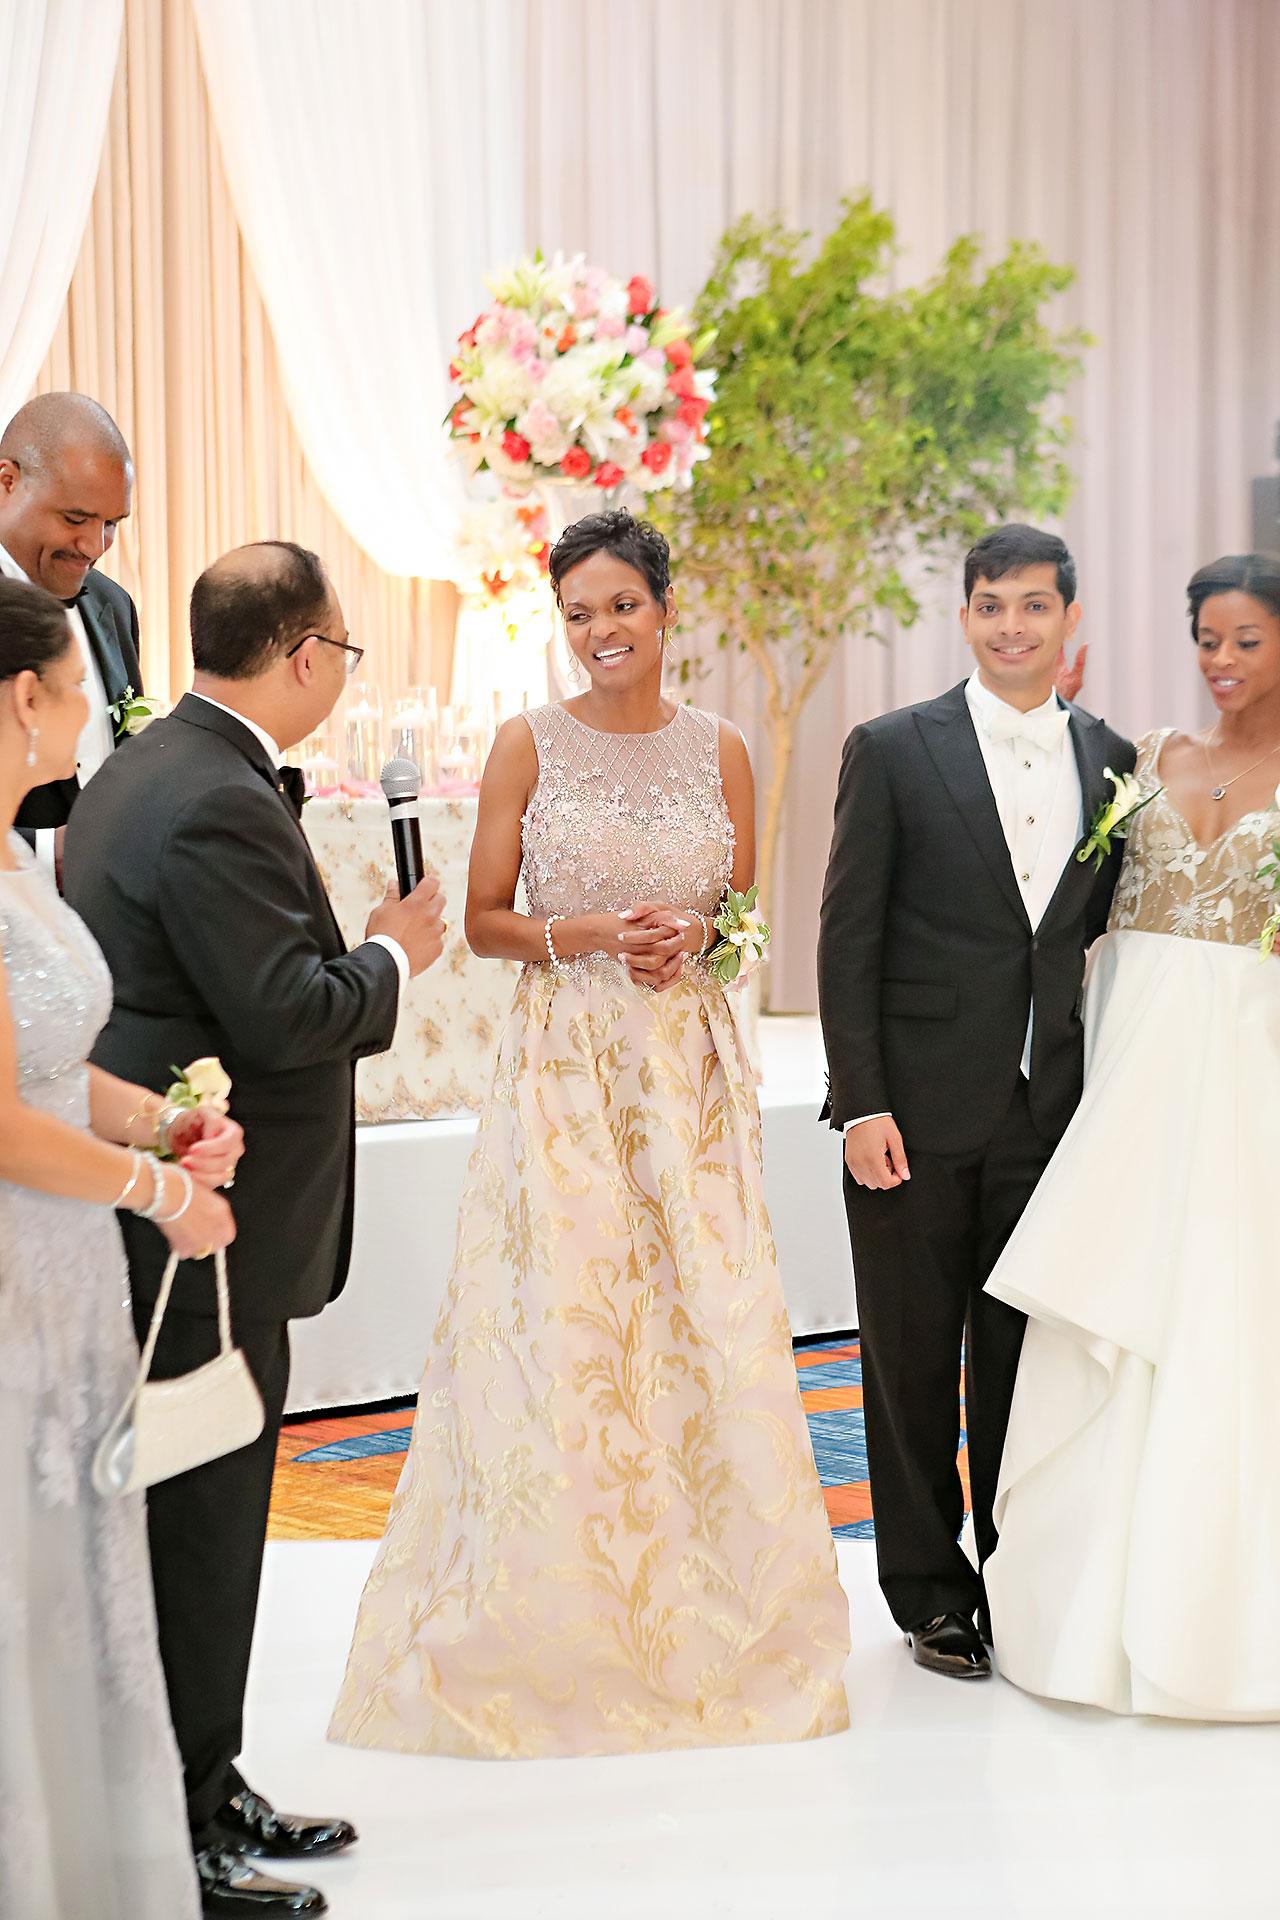 Joie Nikhil JW Marriott Indianapolis Wedding 081